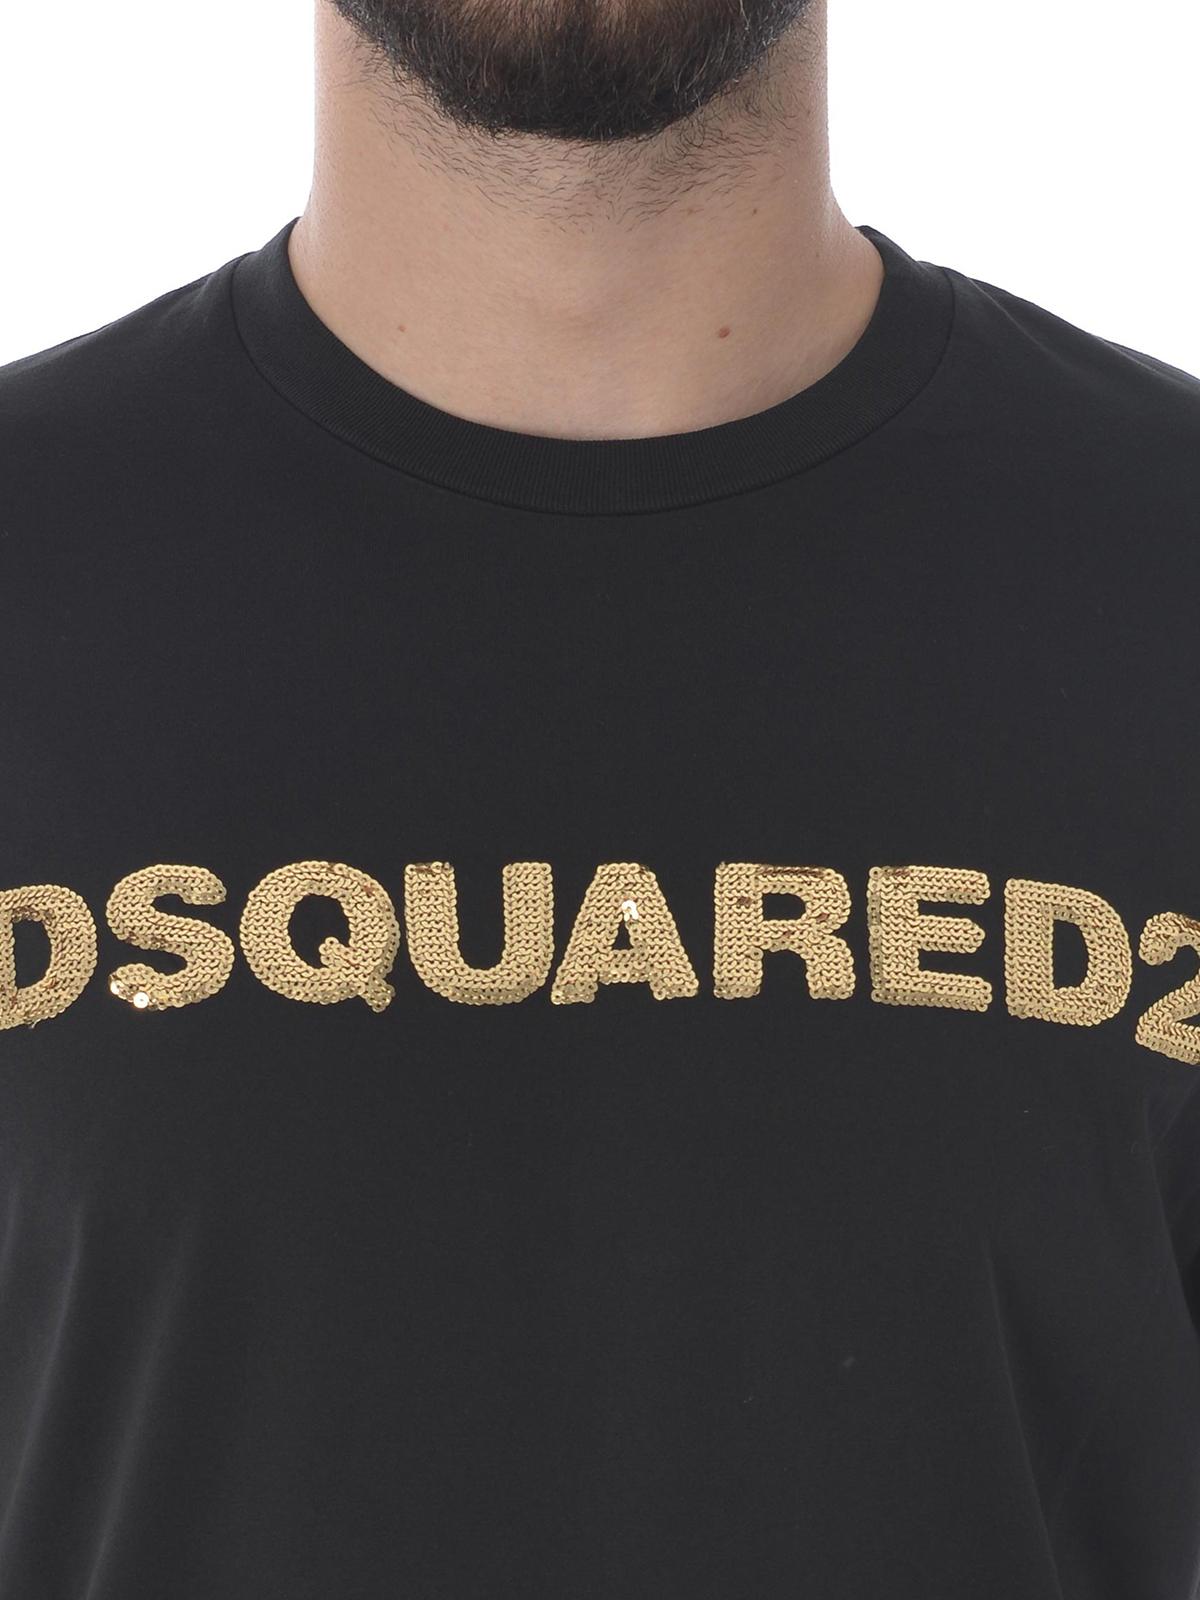 f5c39fa0ff8c Dsquared2 - Gold-tone sequined Dsquared2 logo T-shirt - t-shirts ...